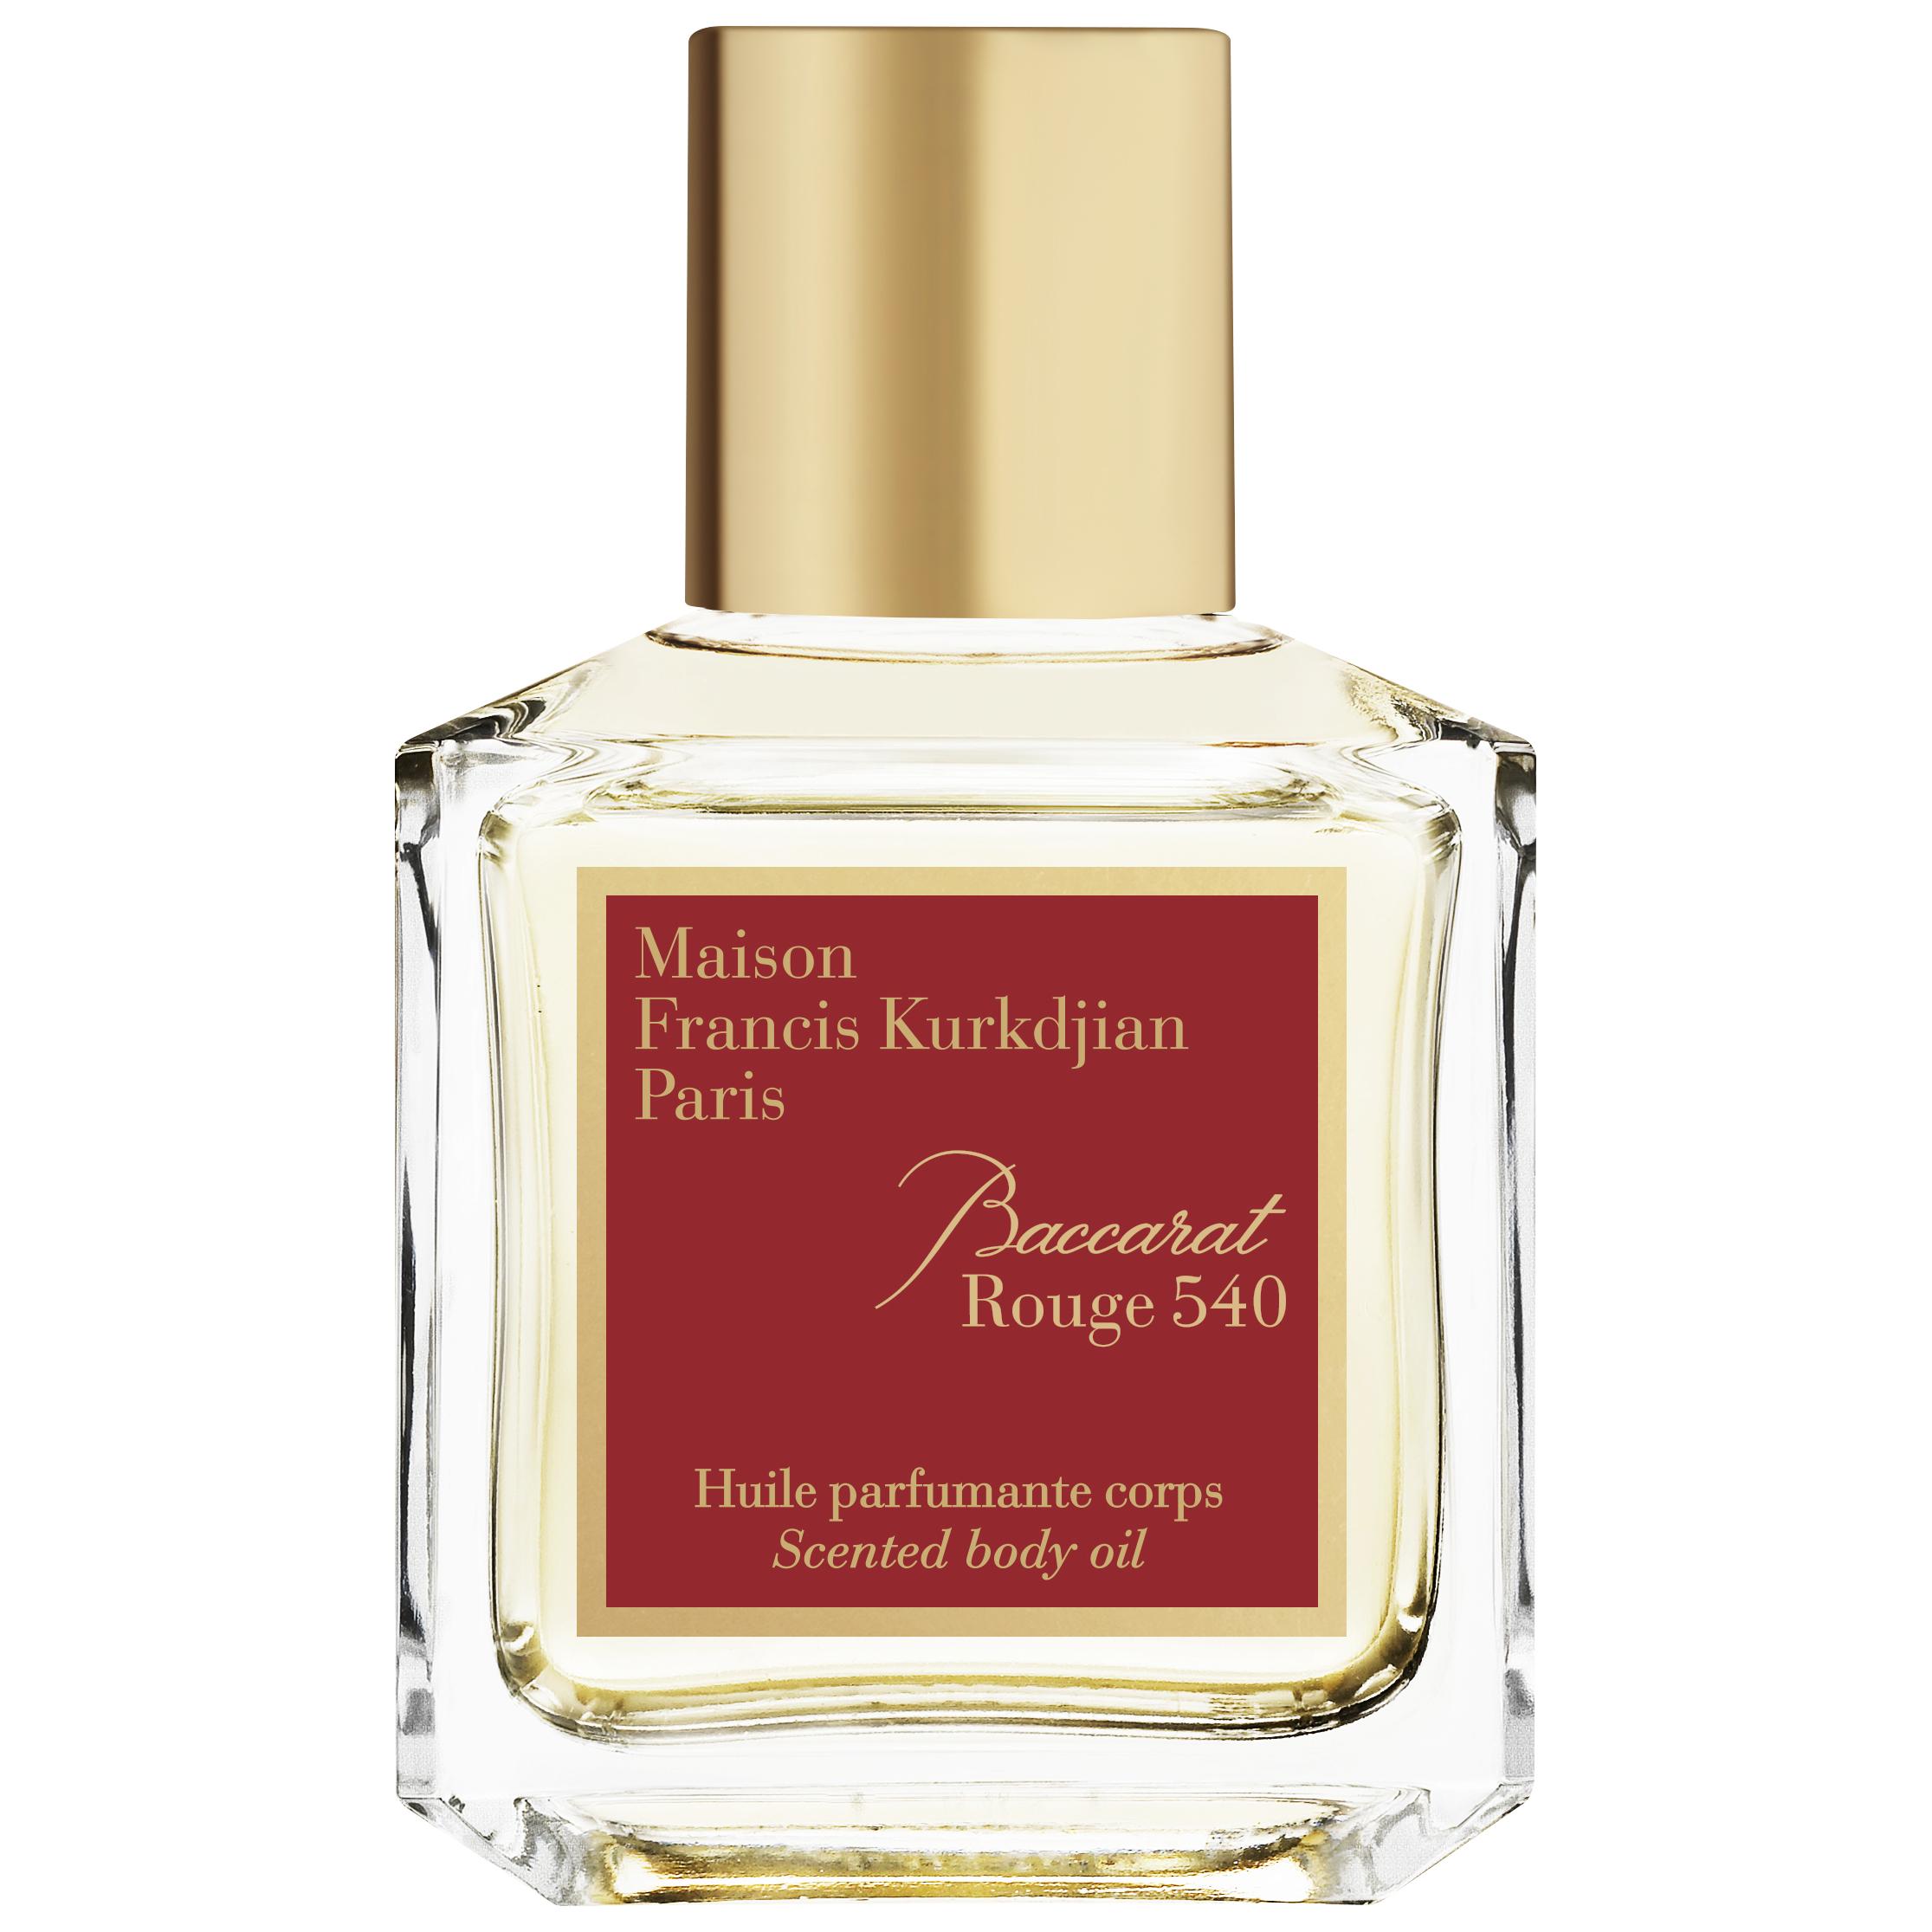 Maison Francis Kurkdjian Baccarat Rouge 20 Scented Body Oil